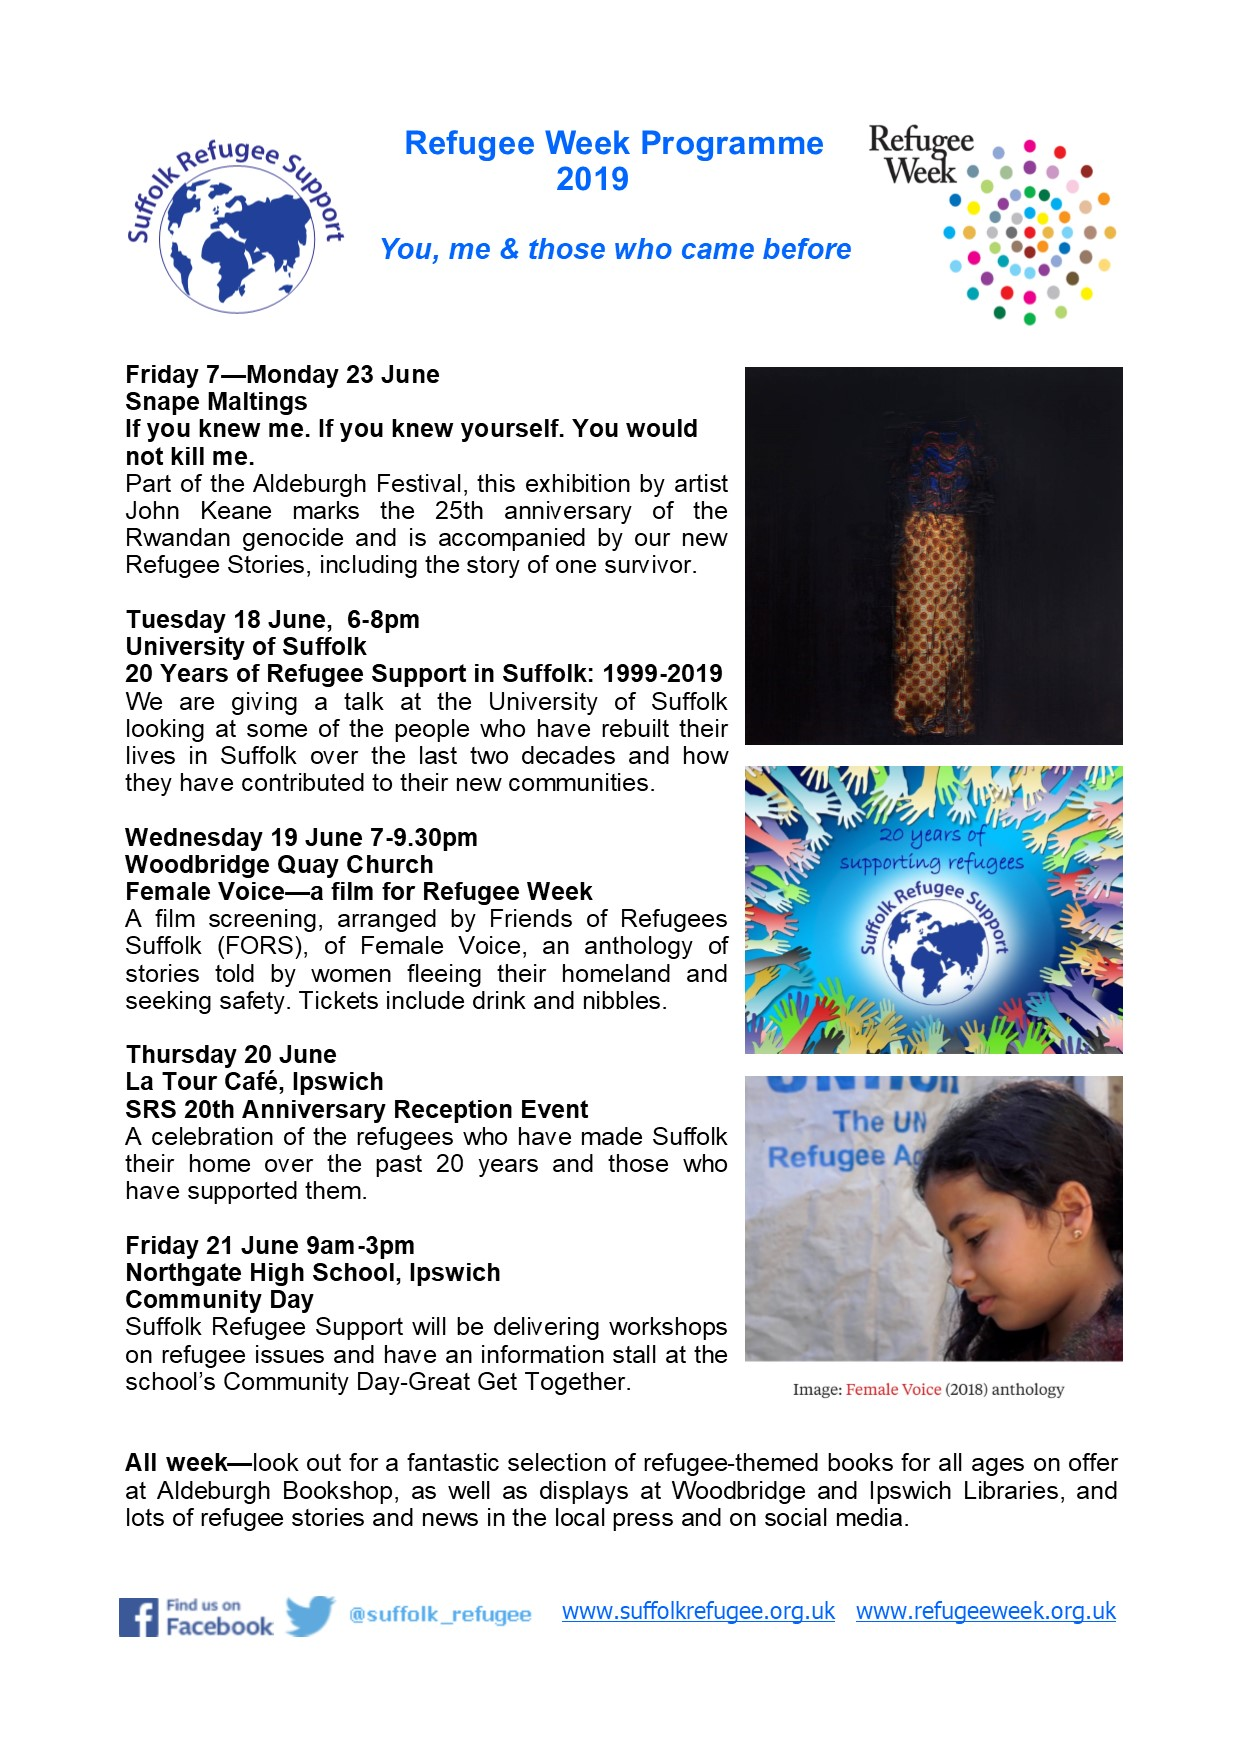 Refugee Week 2019 programme